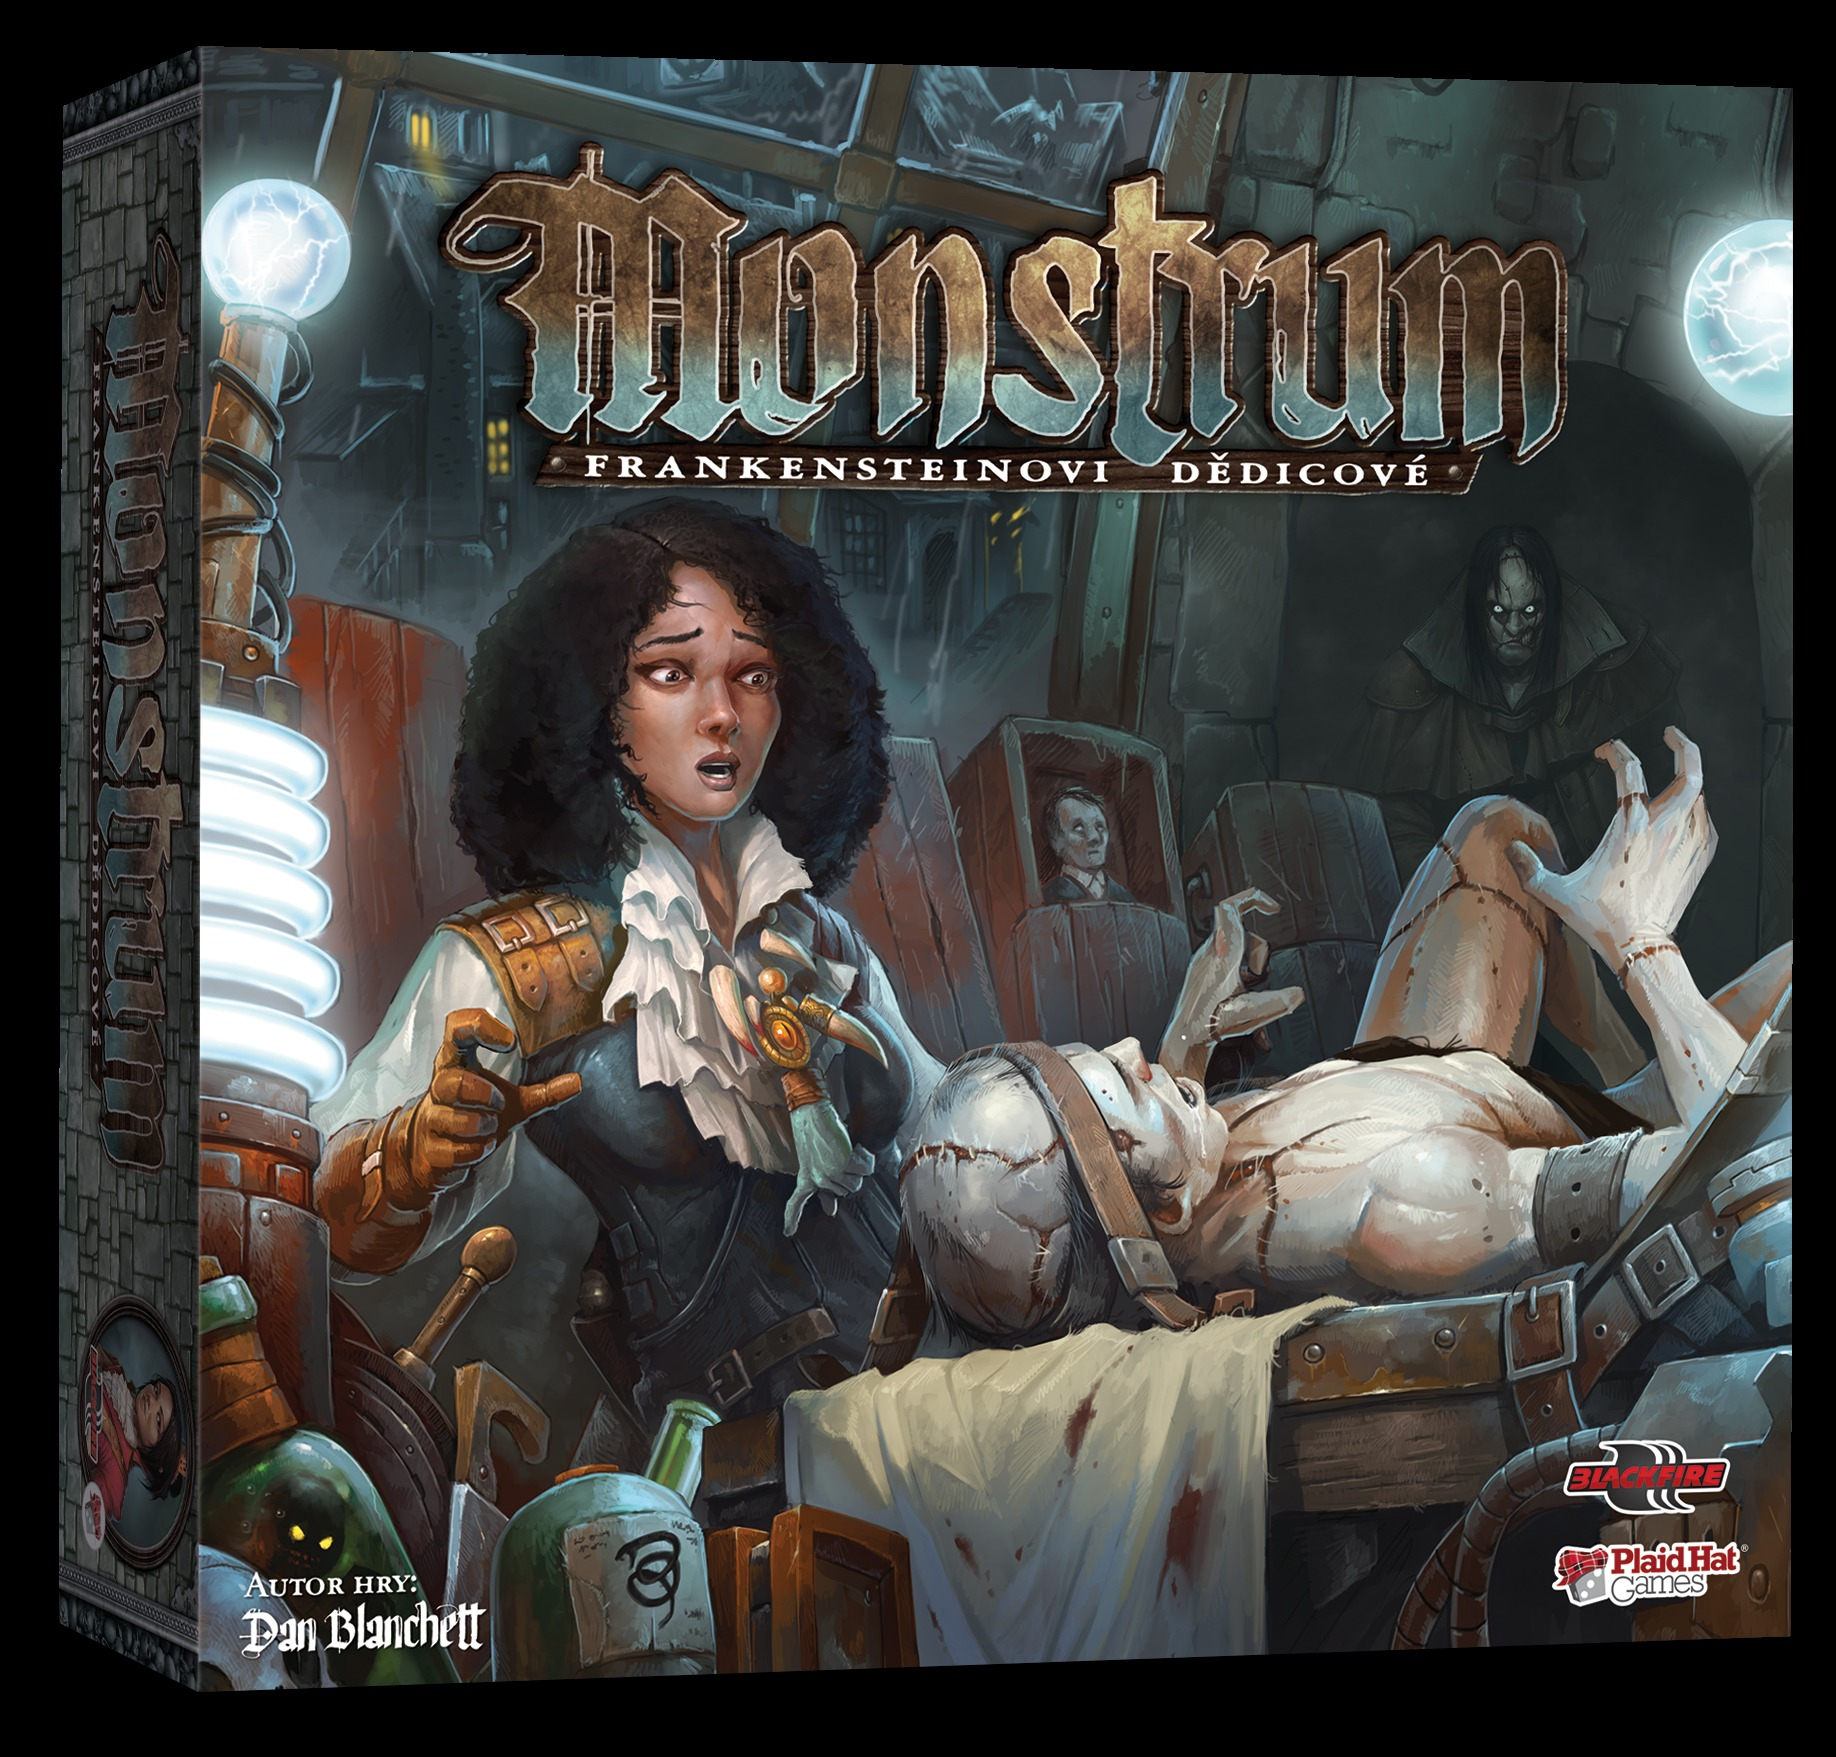 Monstrum: Frankensteinovi dědicové (PC)